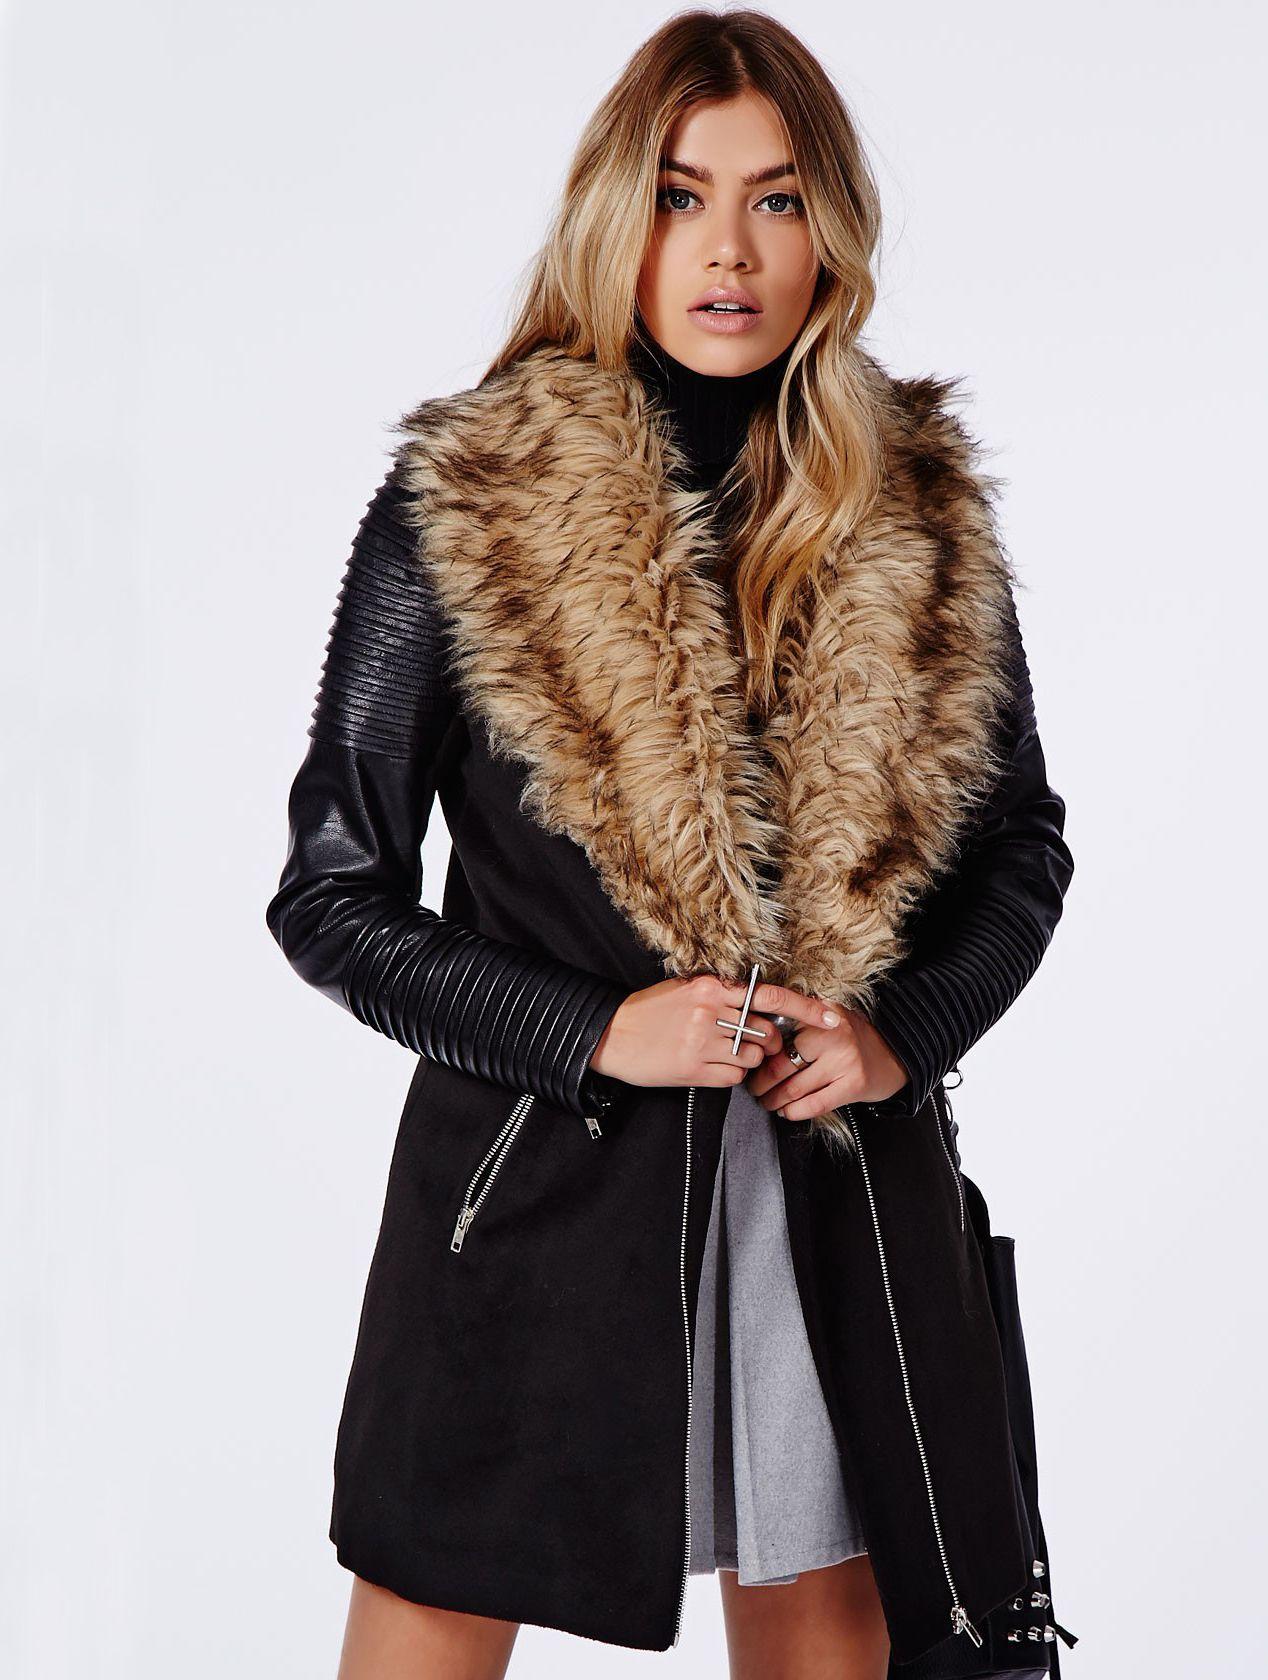 Black PU Leather Sleeve Faux Fur Lapel Coat Sheinside